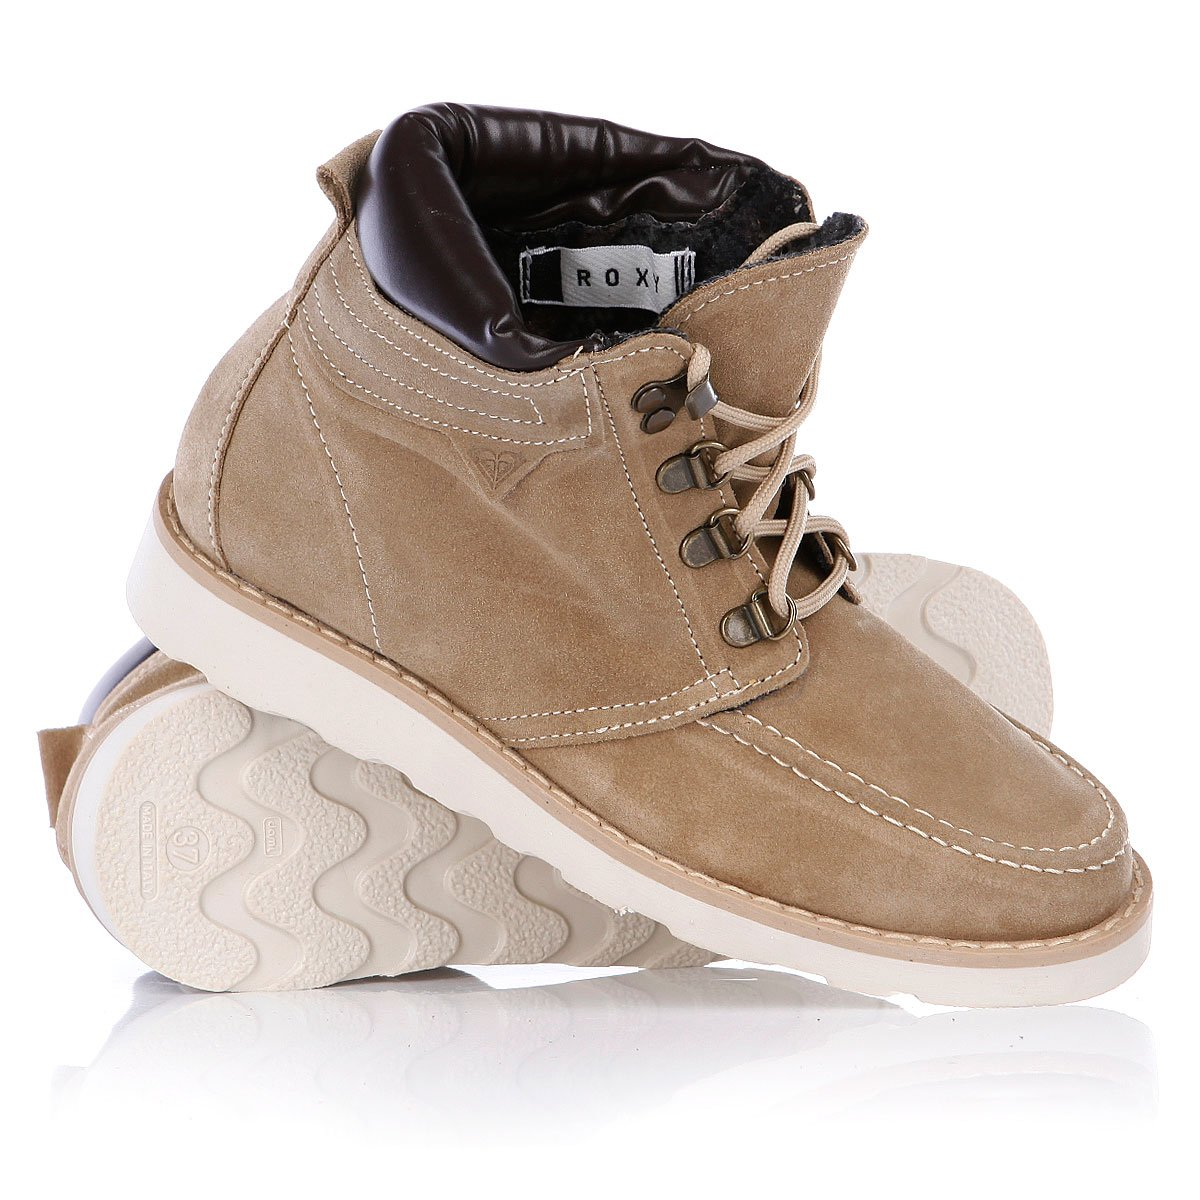 5f03945323aa Купить ботинки женские Roxy Joelle Iii Sand (WTWSL293) в интернет ...